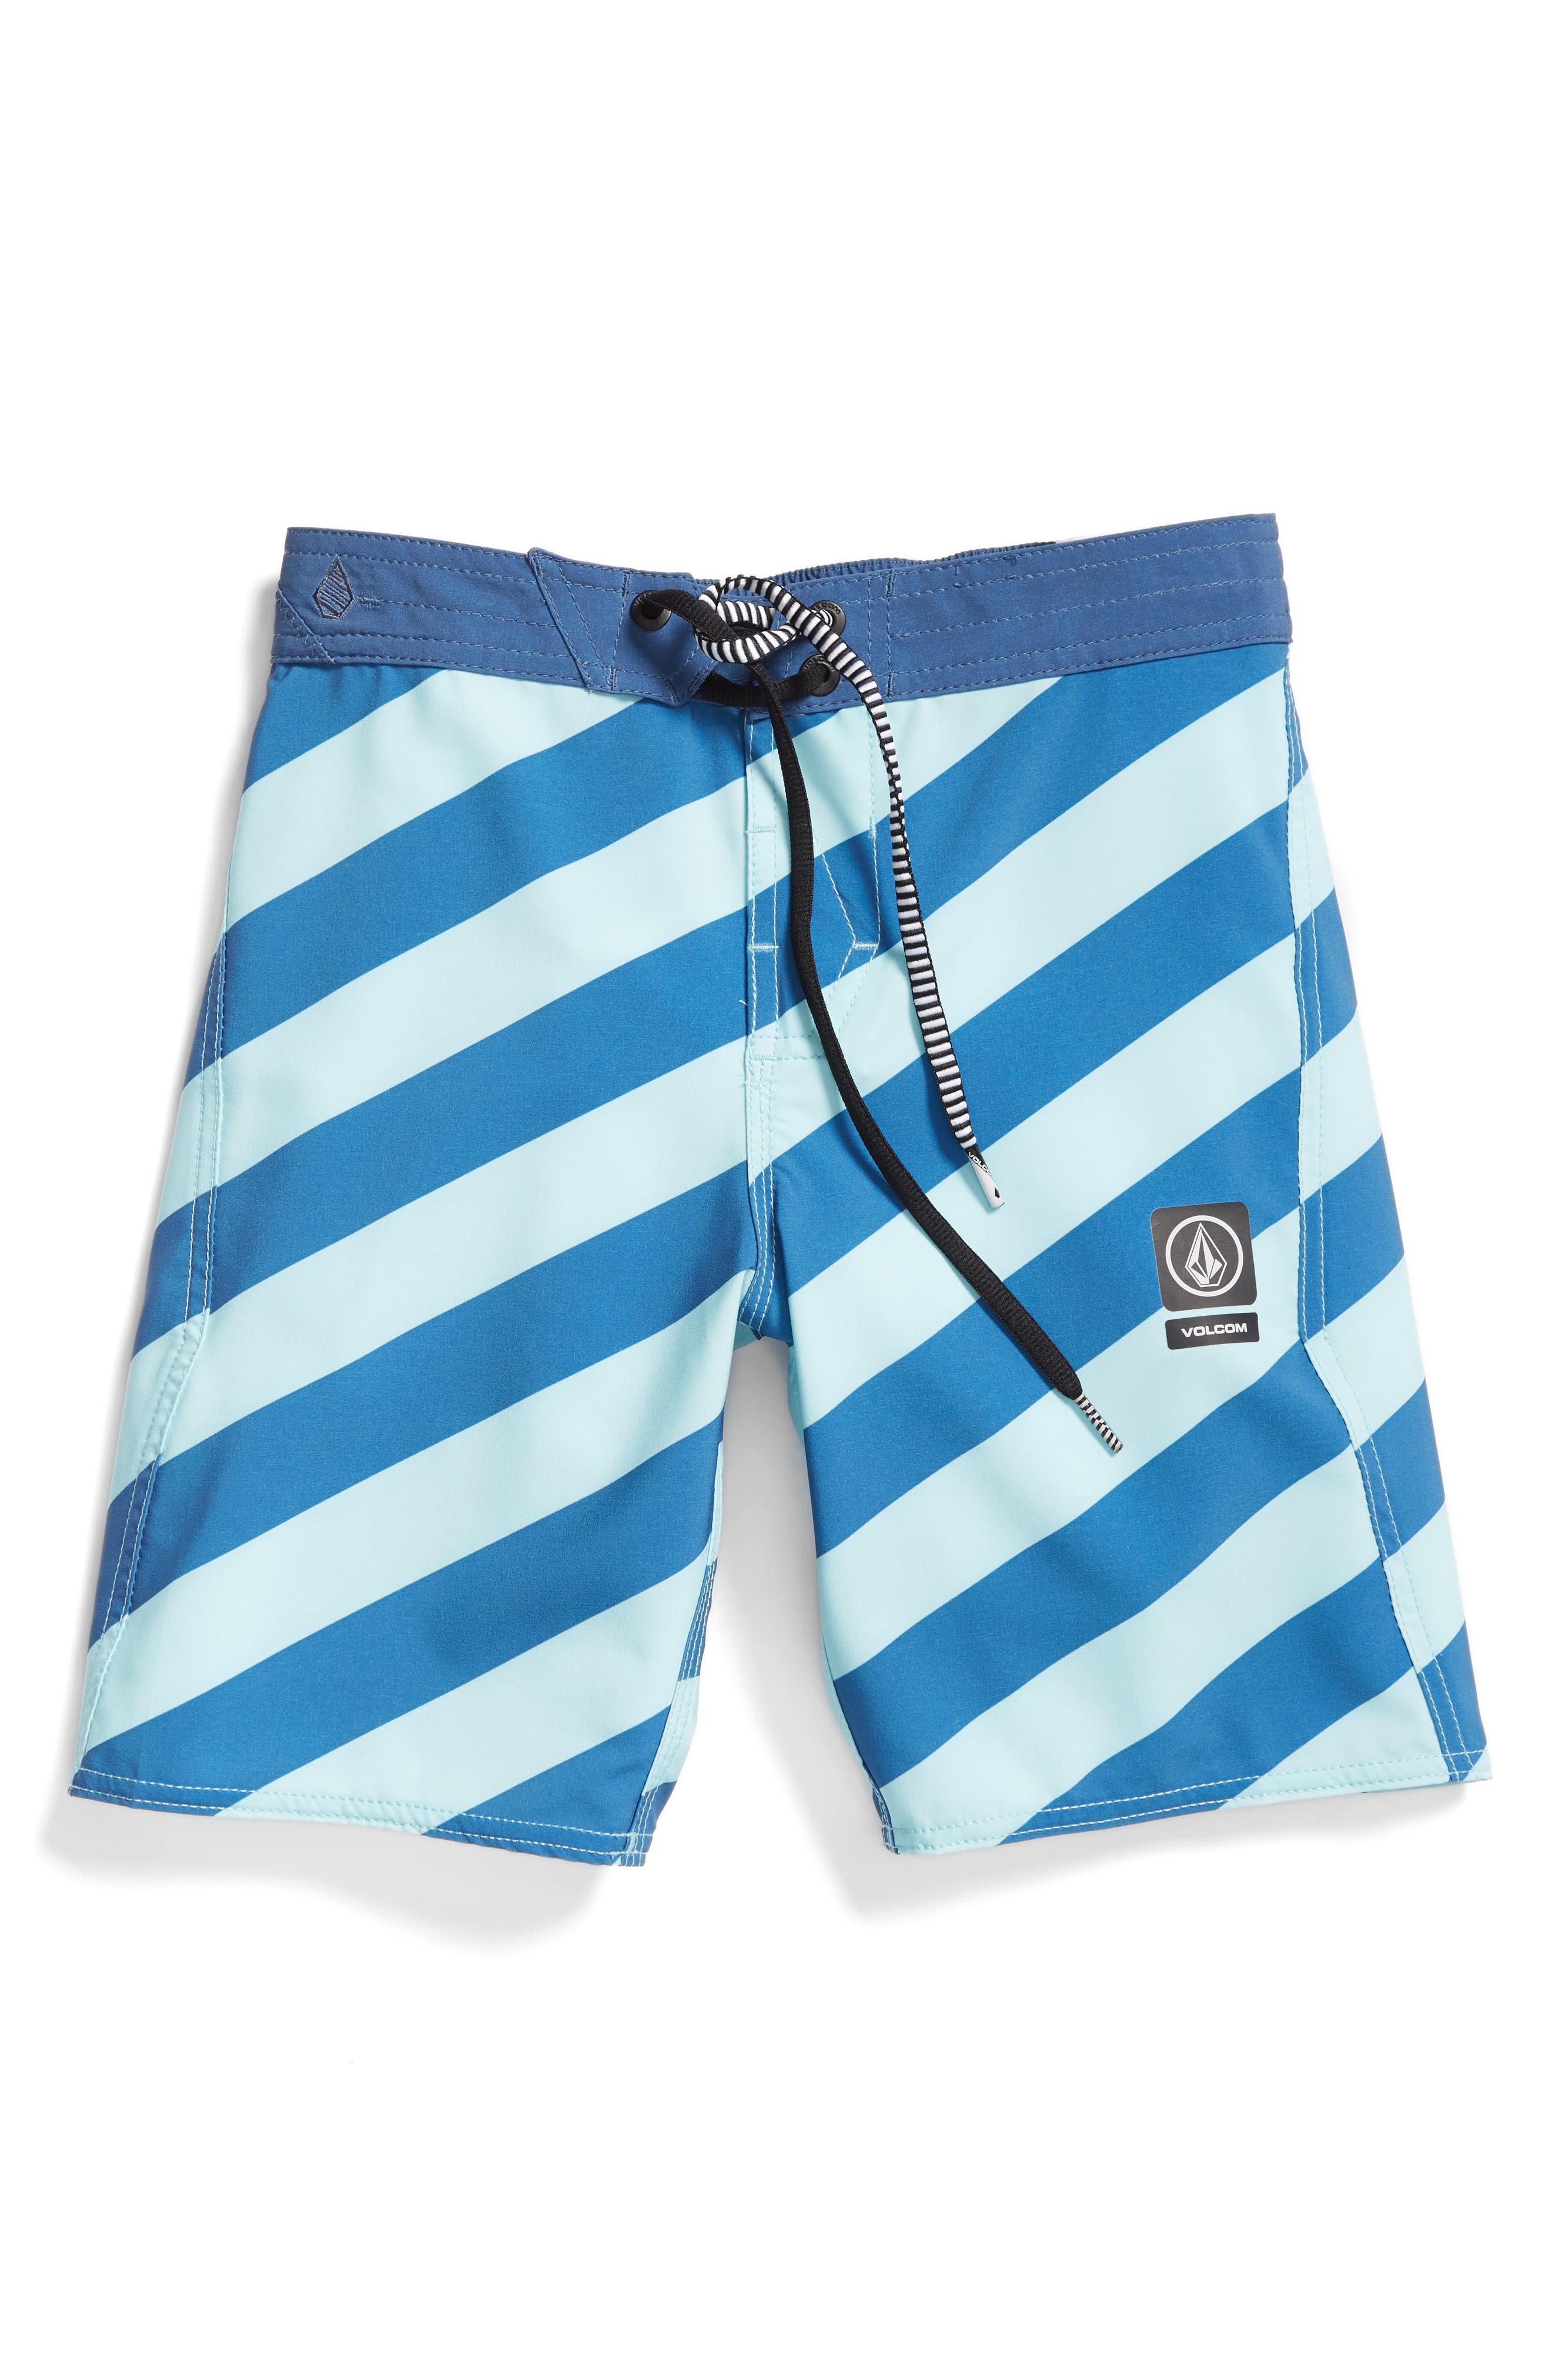 Stripey Jammer Board Shorts,                             Main thumbnail 4, color,